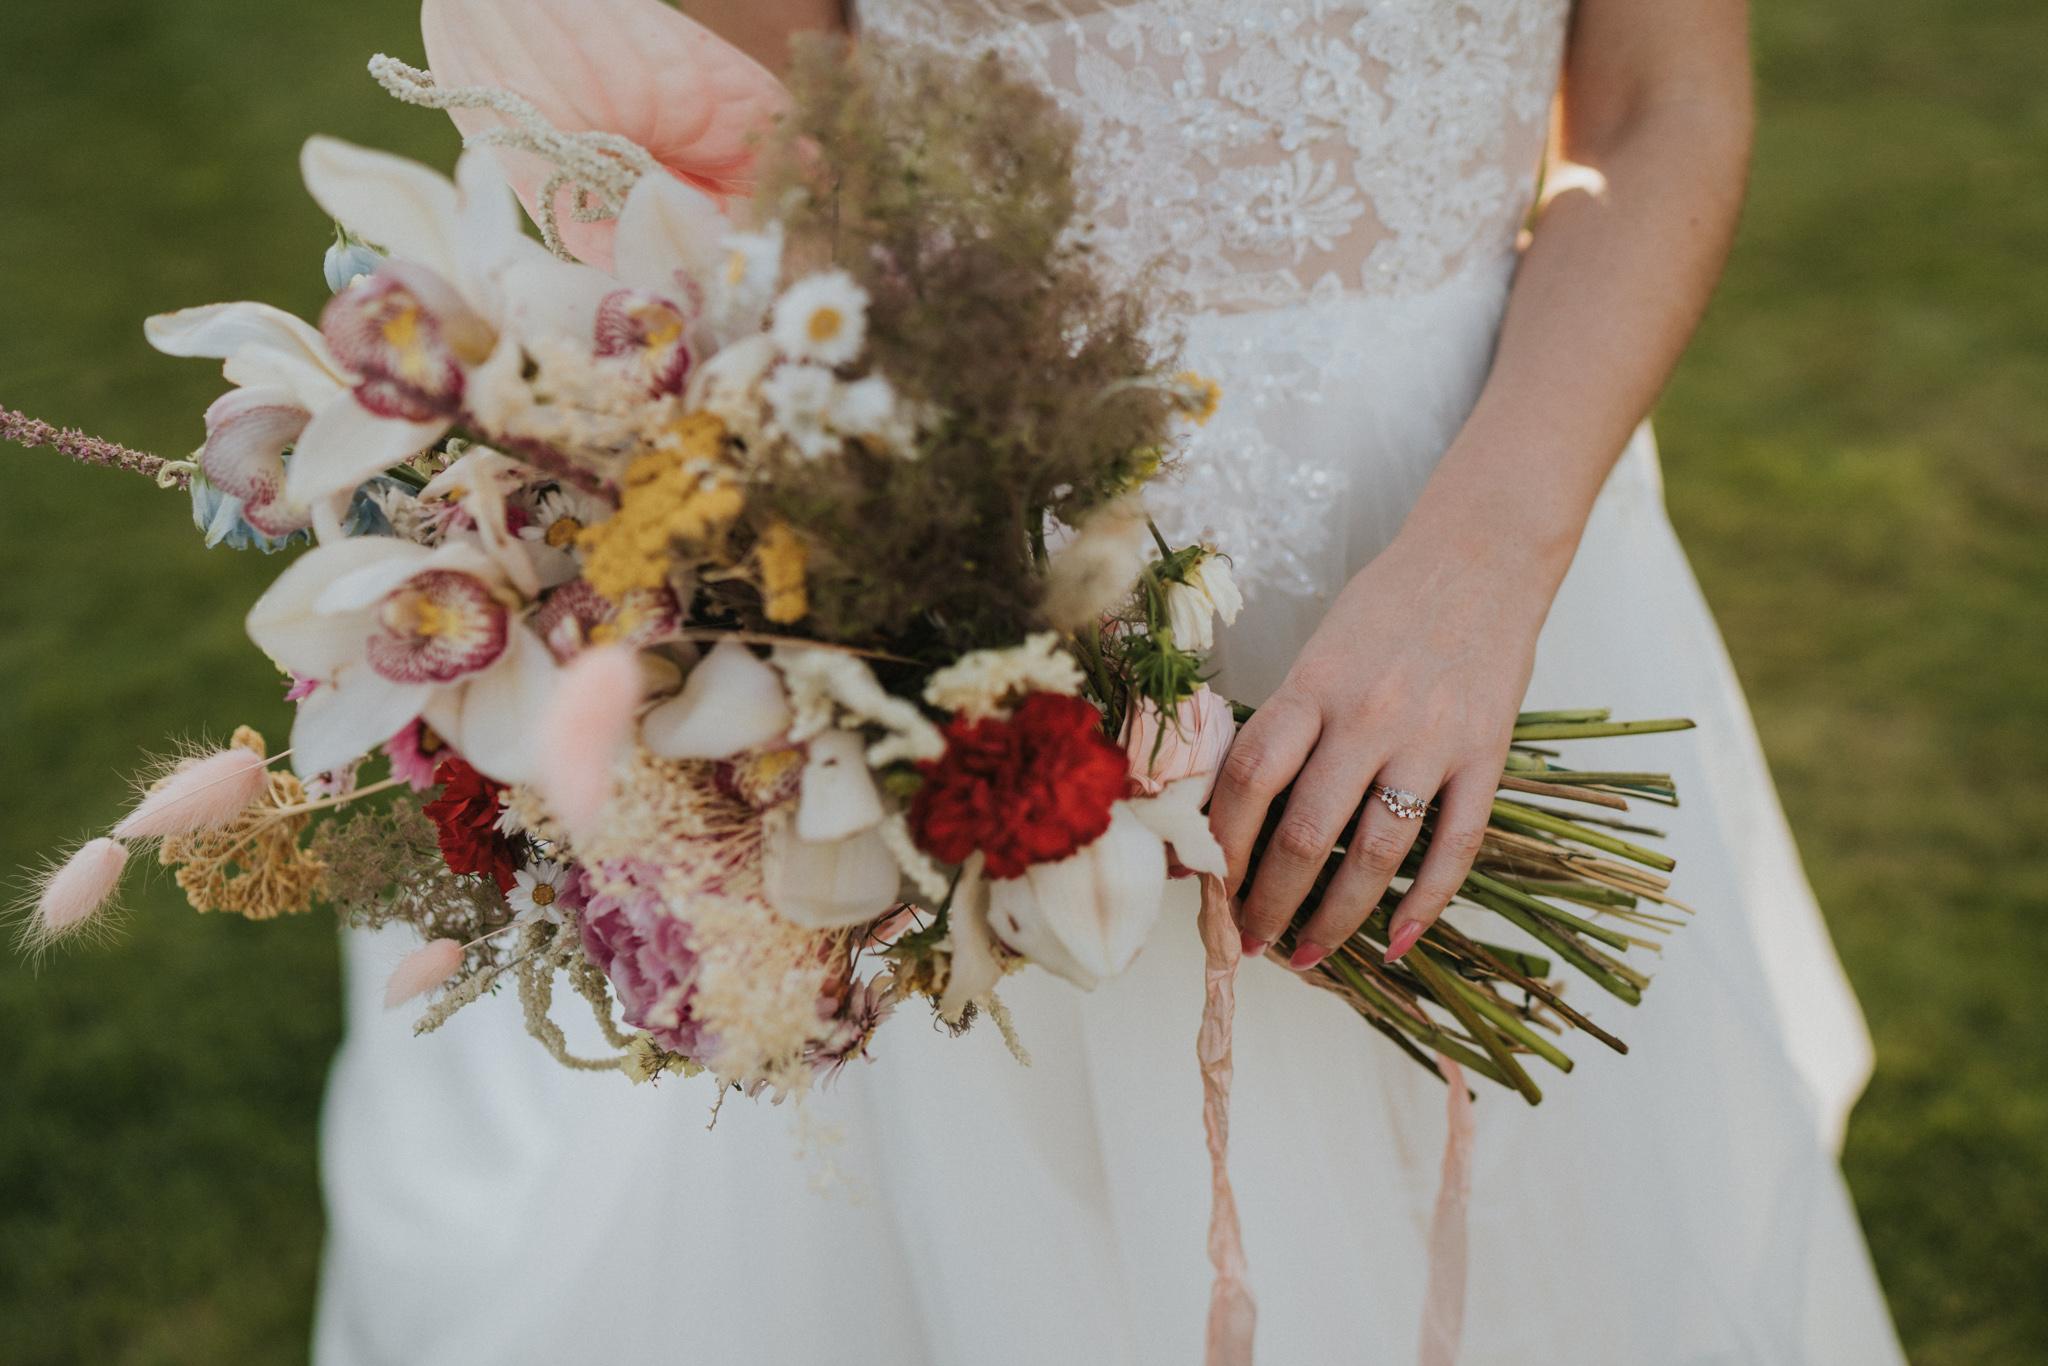 emi-Jack-boho-diy-wedding-eggington-house-grace-elizabeth-colchester-essex-alternative-wedding-photographer-suffolk-norfolk-devon (49 of 56).jpg